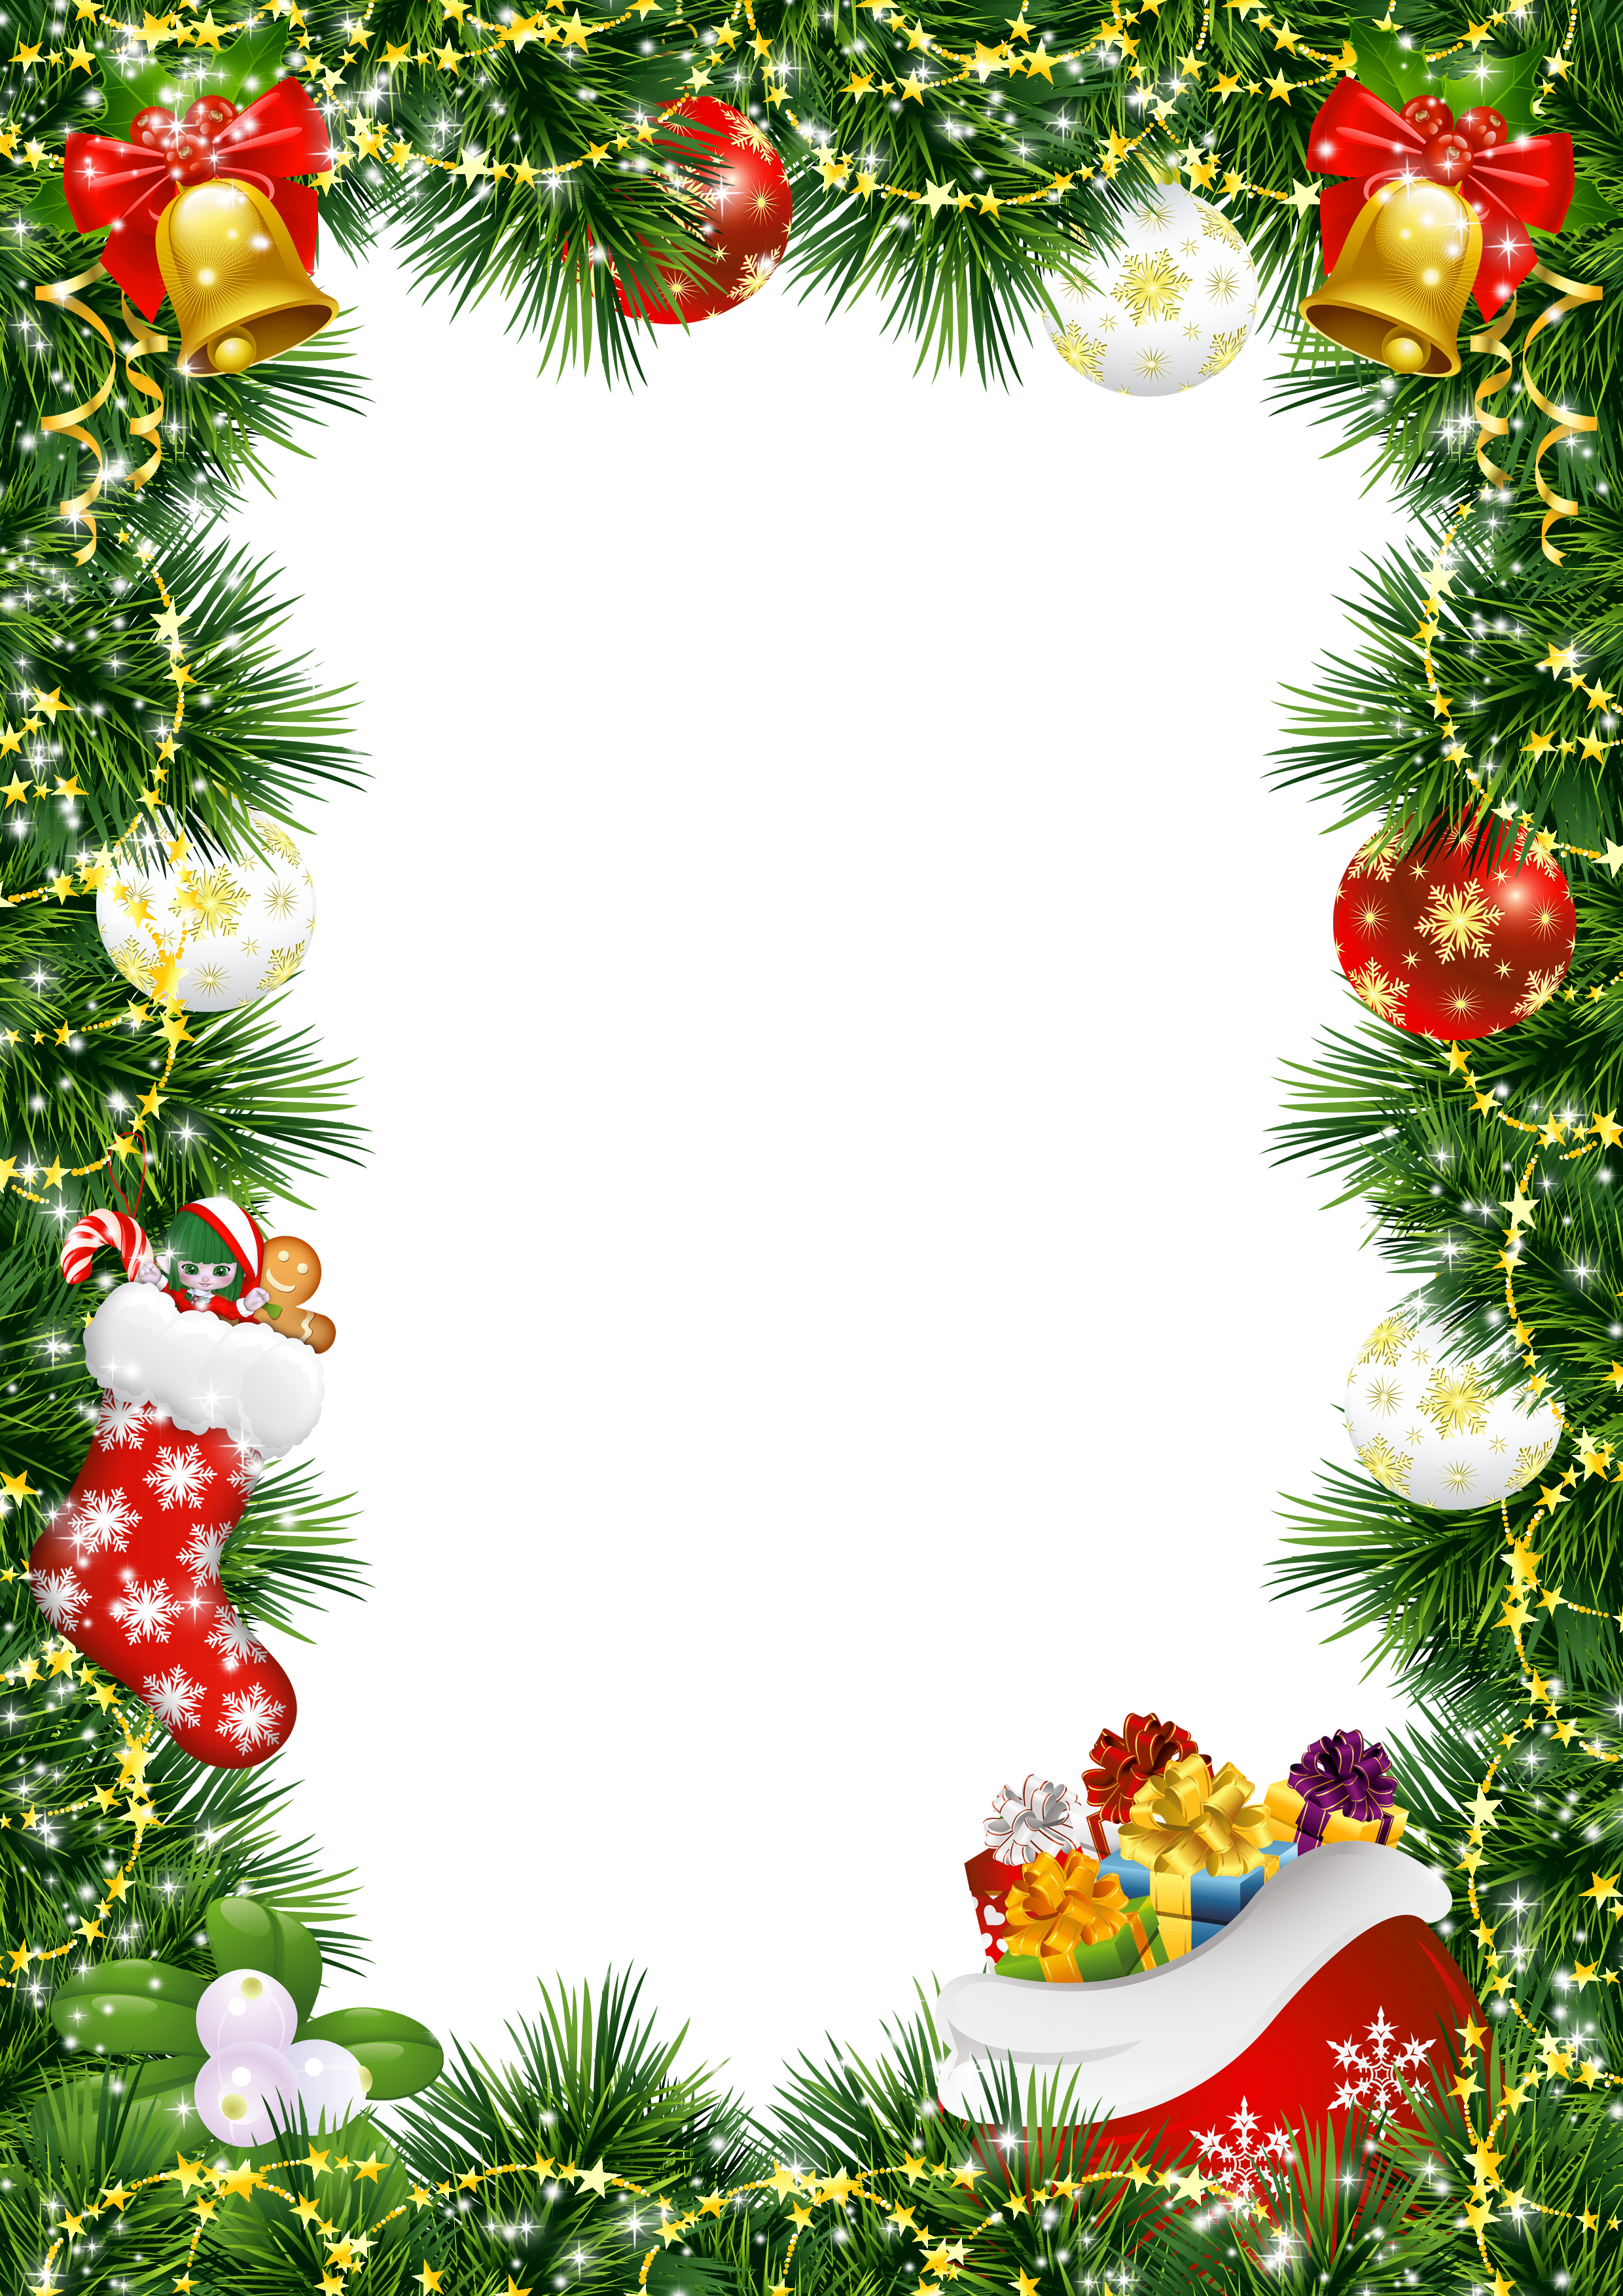 Christmas ornament frames - Christmas Photo Frame With Christmas Ornaments